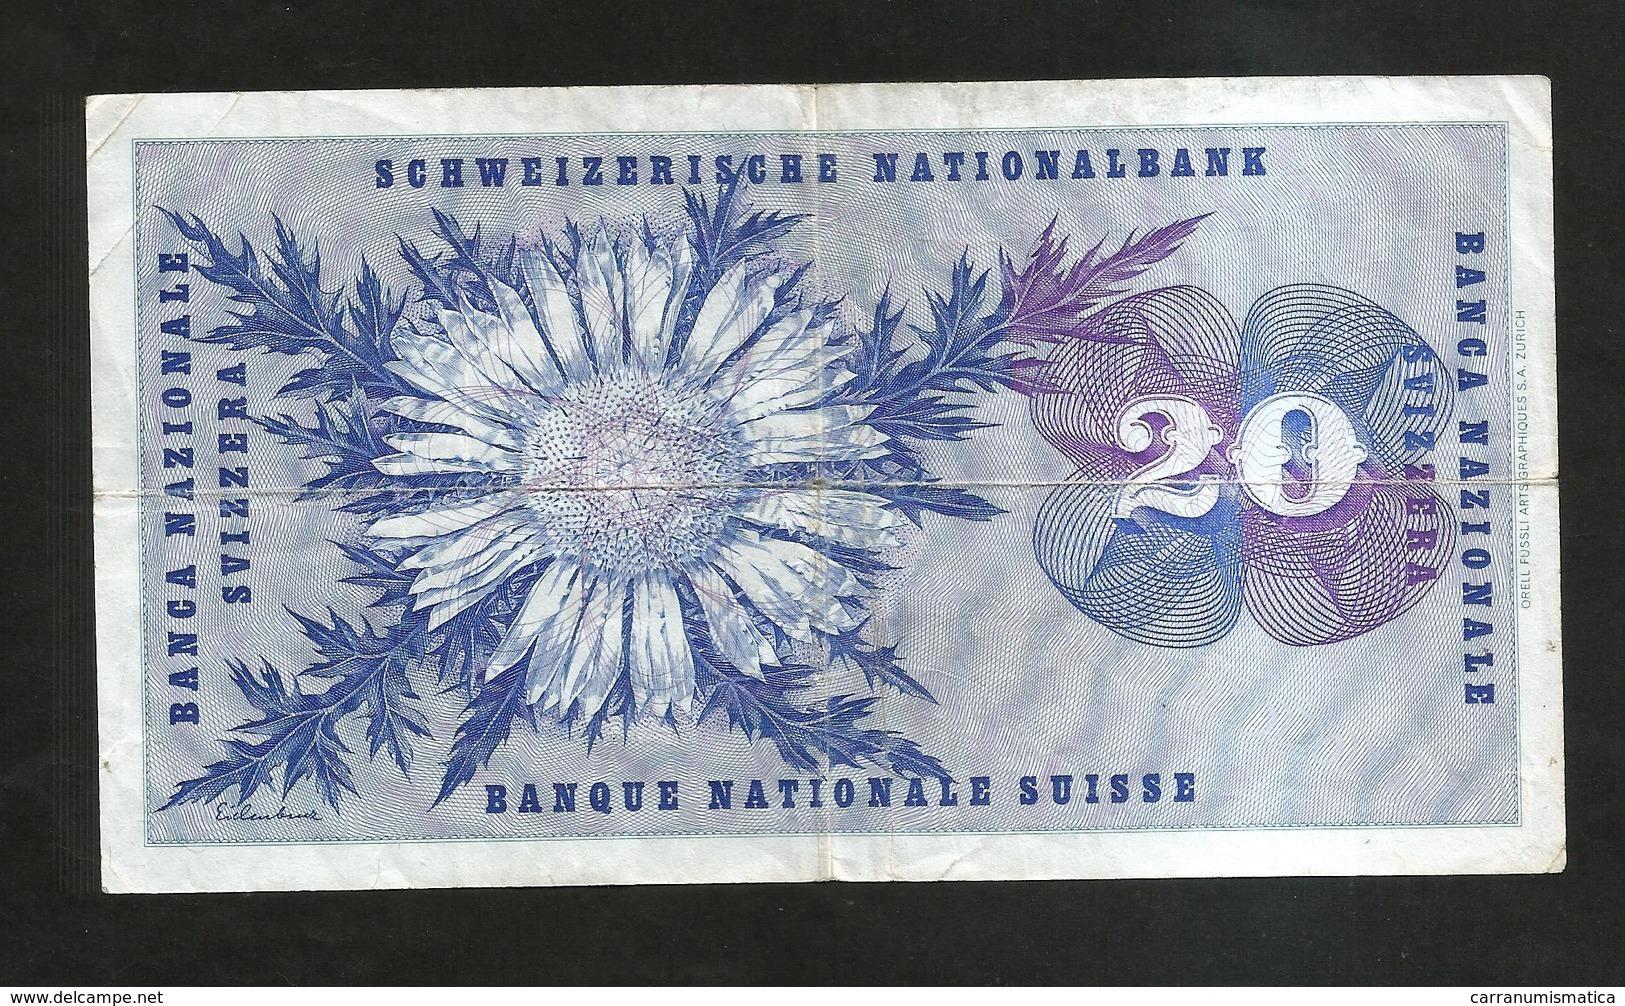 SVIZZERA / SUISSE / SWITZERLAND - NATIONAL BANK - 20 FRANCS / FRANKEN (1973)  H. DUFOUR - Svizzera